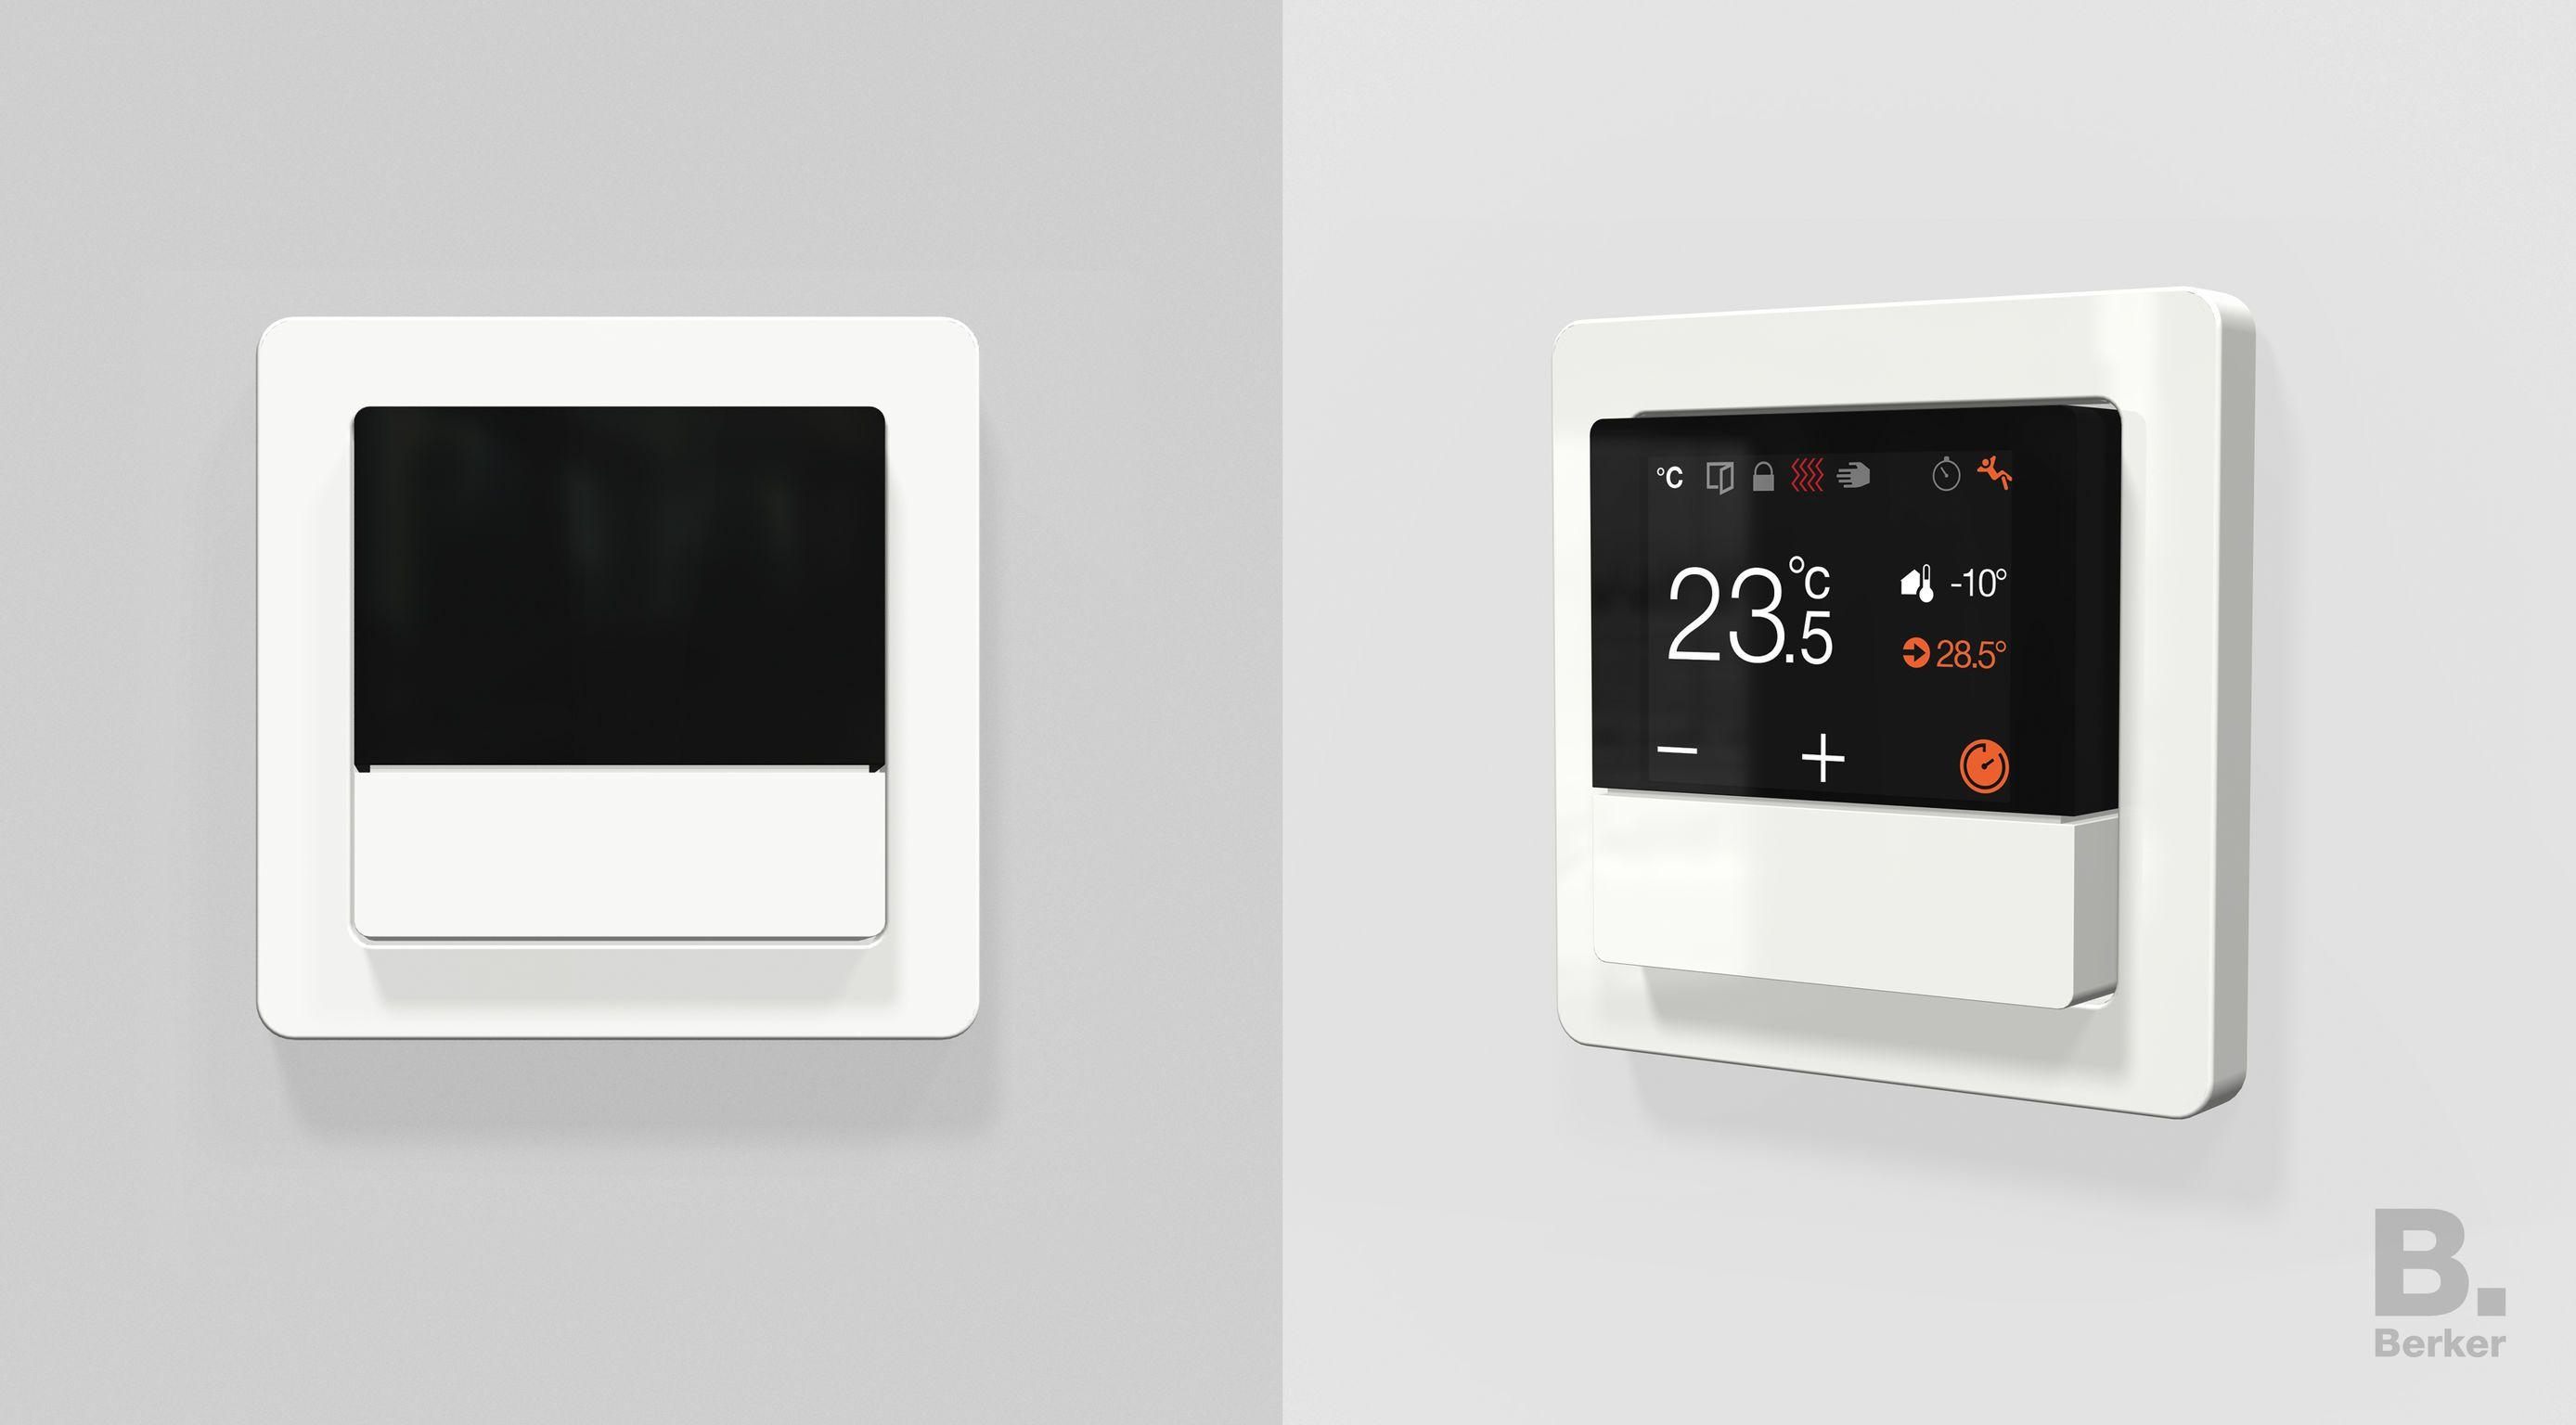 Berker Knx Raumcontroller Iot Design Devices Design Home Automation